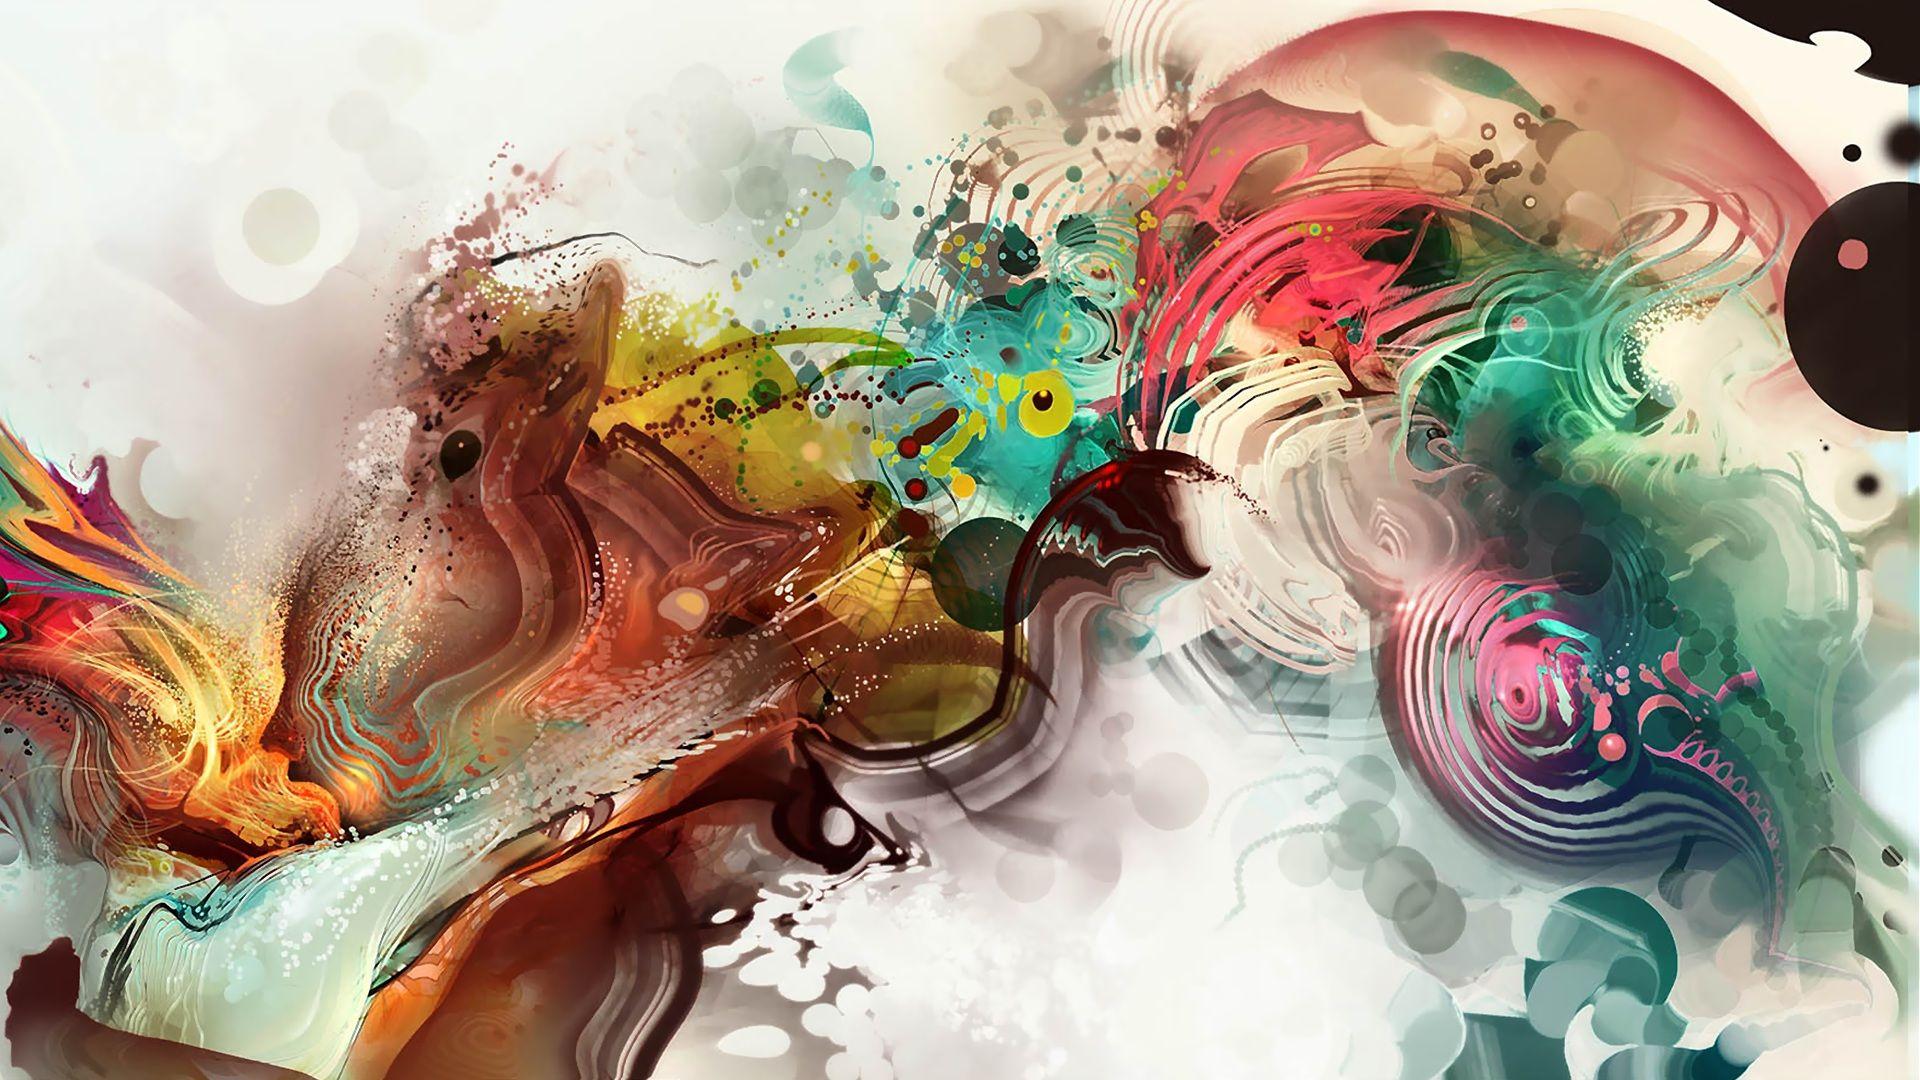 Android Jones abstract wallpaper Artistic wallpaper Cool 1920x1080